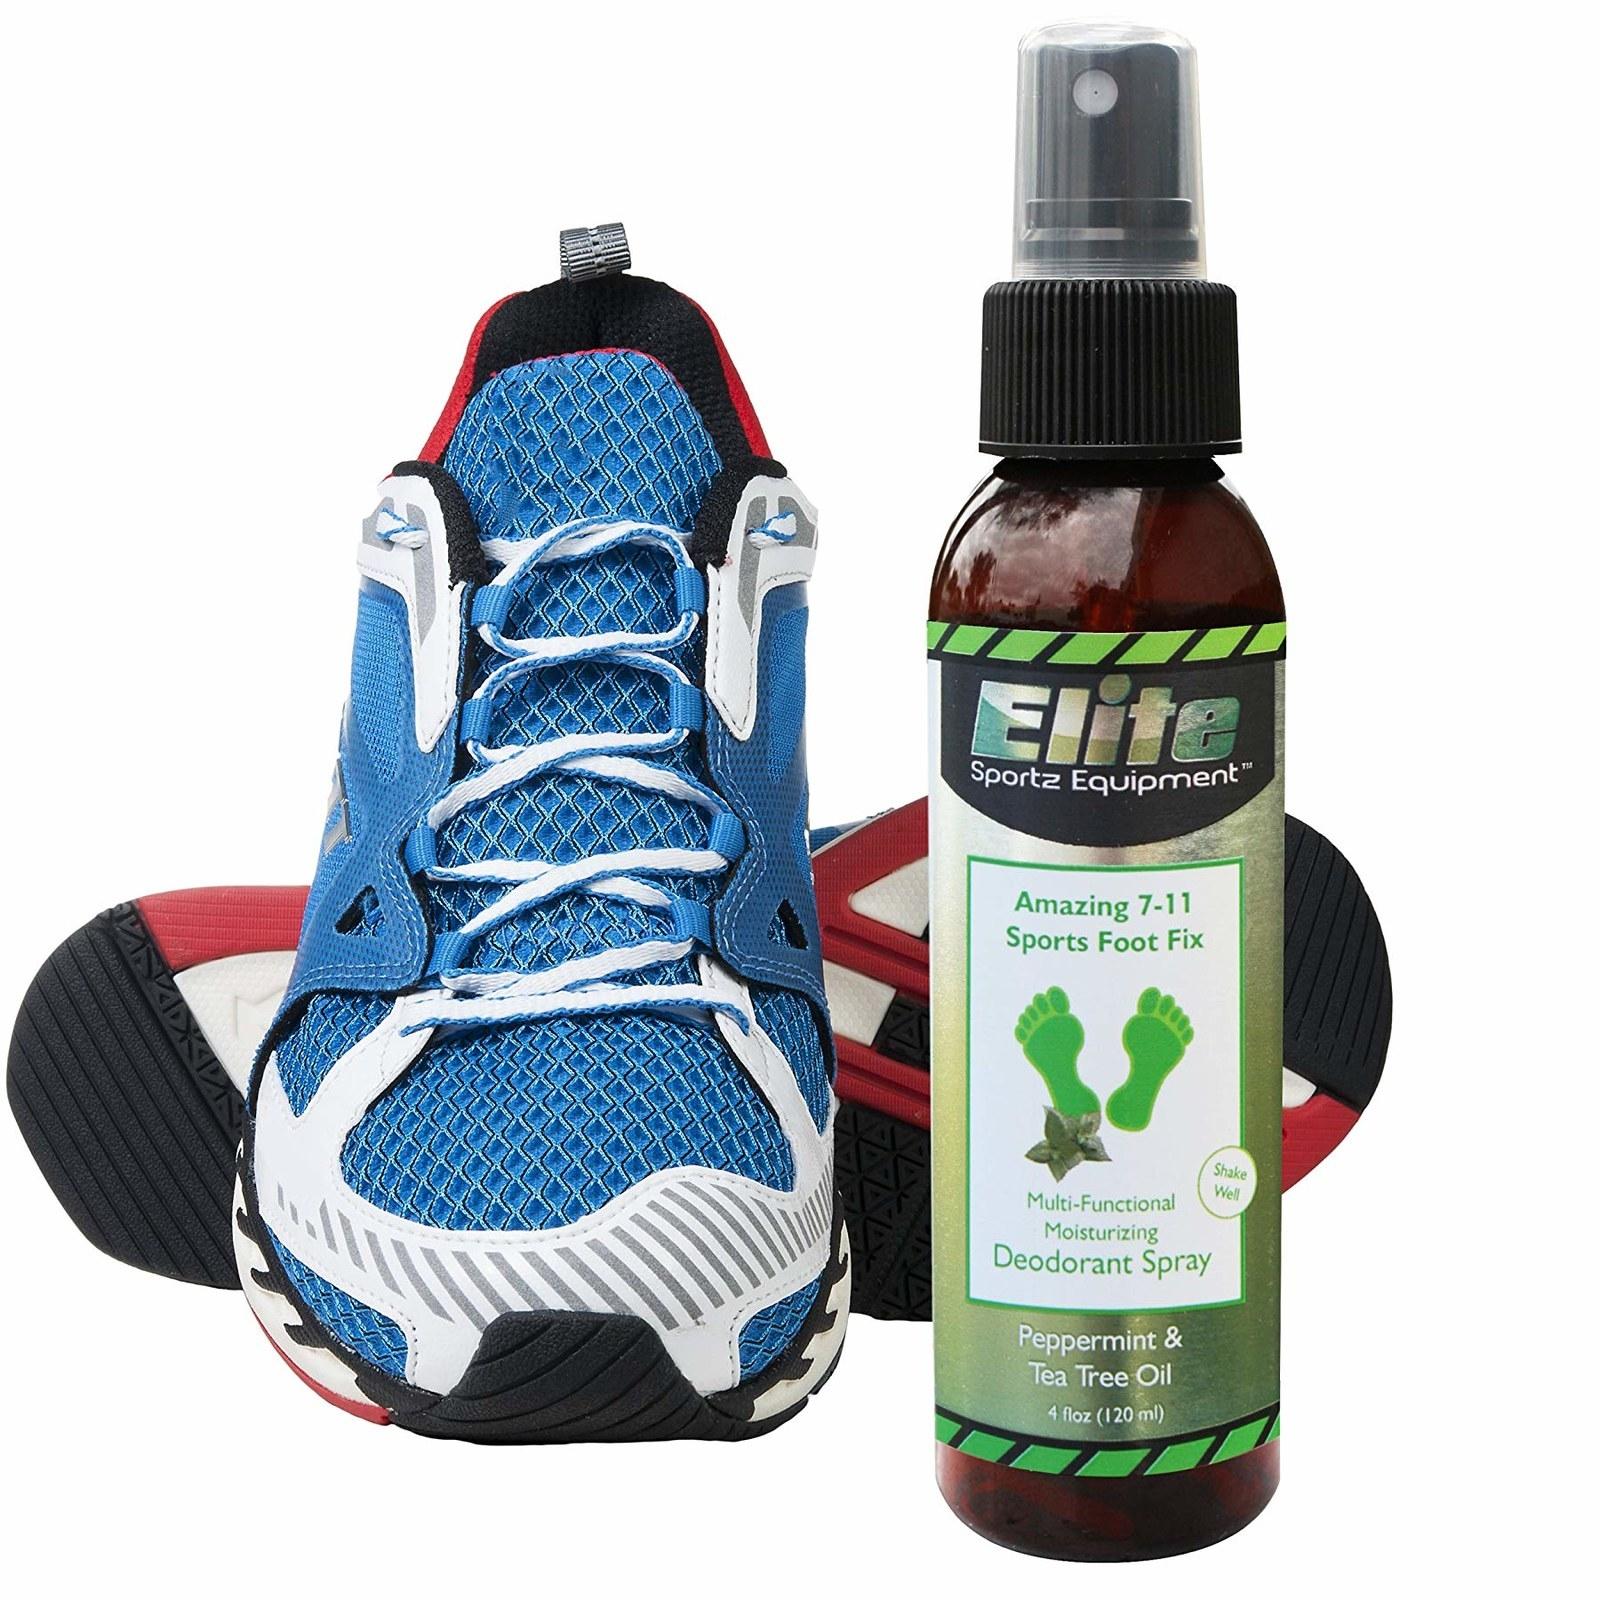 sneaker next to a bottle of Elite sports foot fix